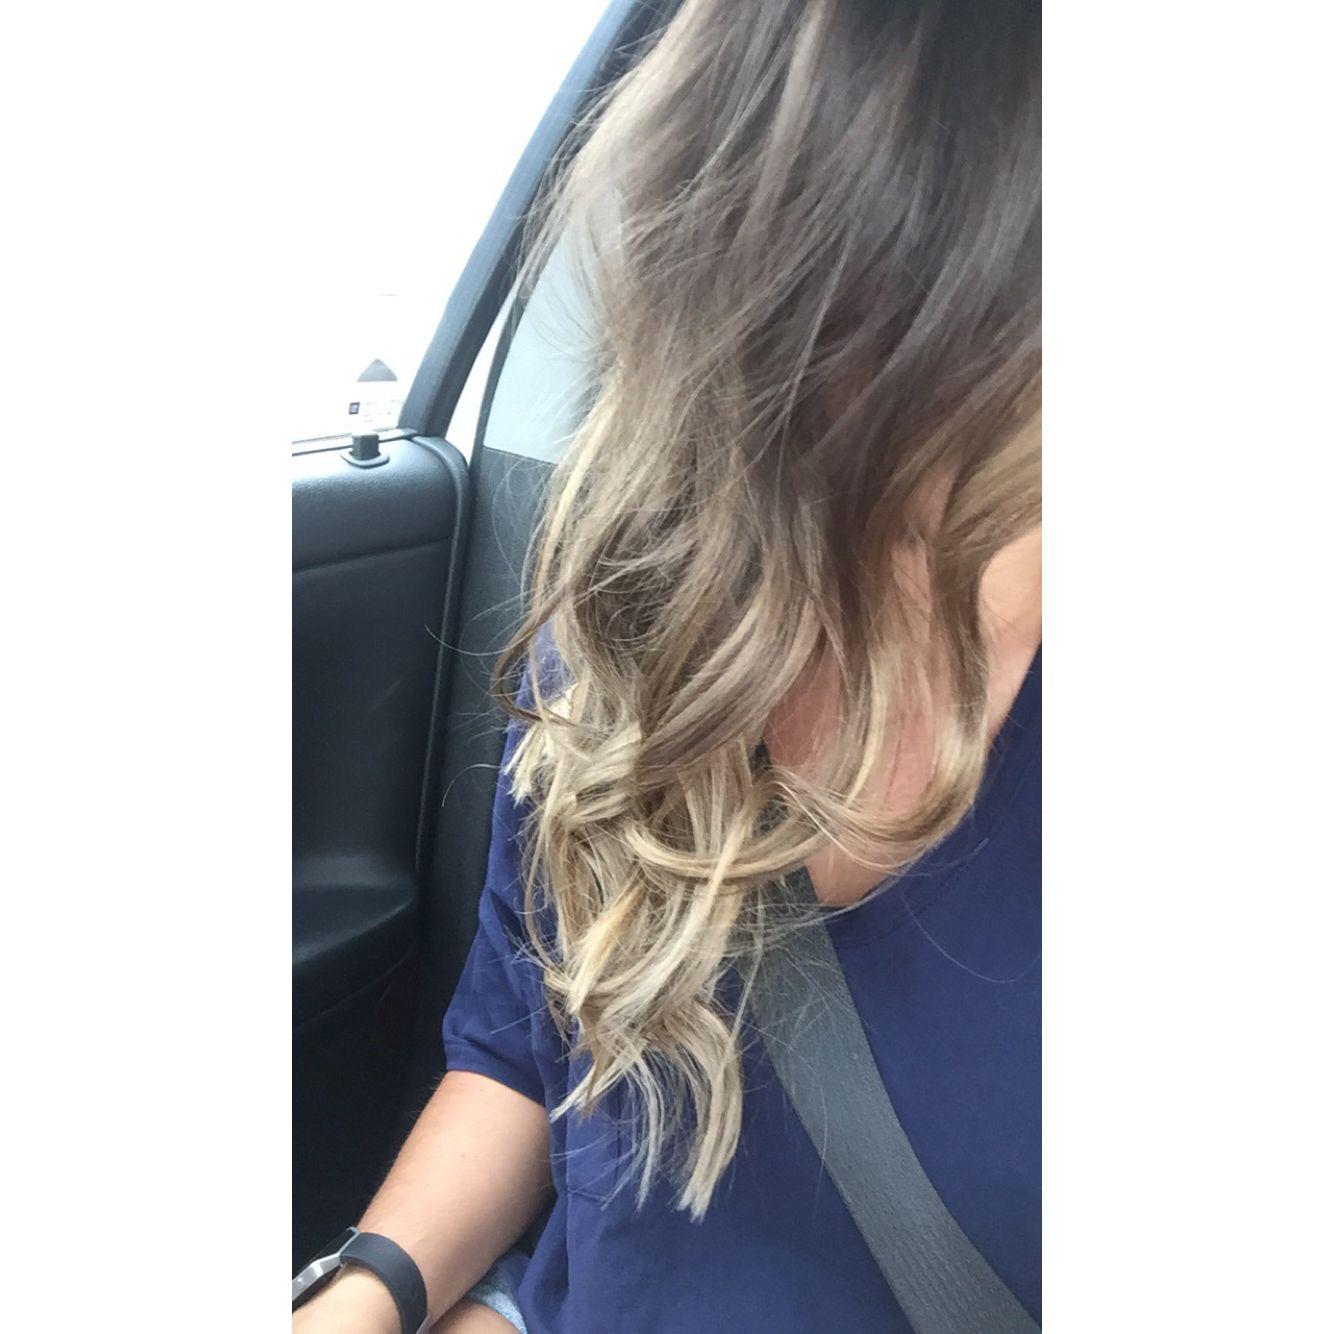 Hair by Jordan!